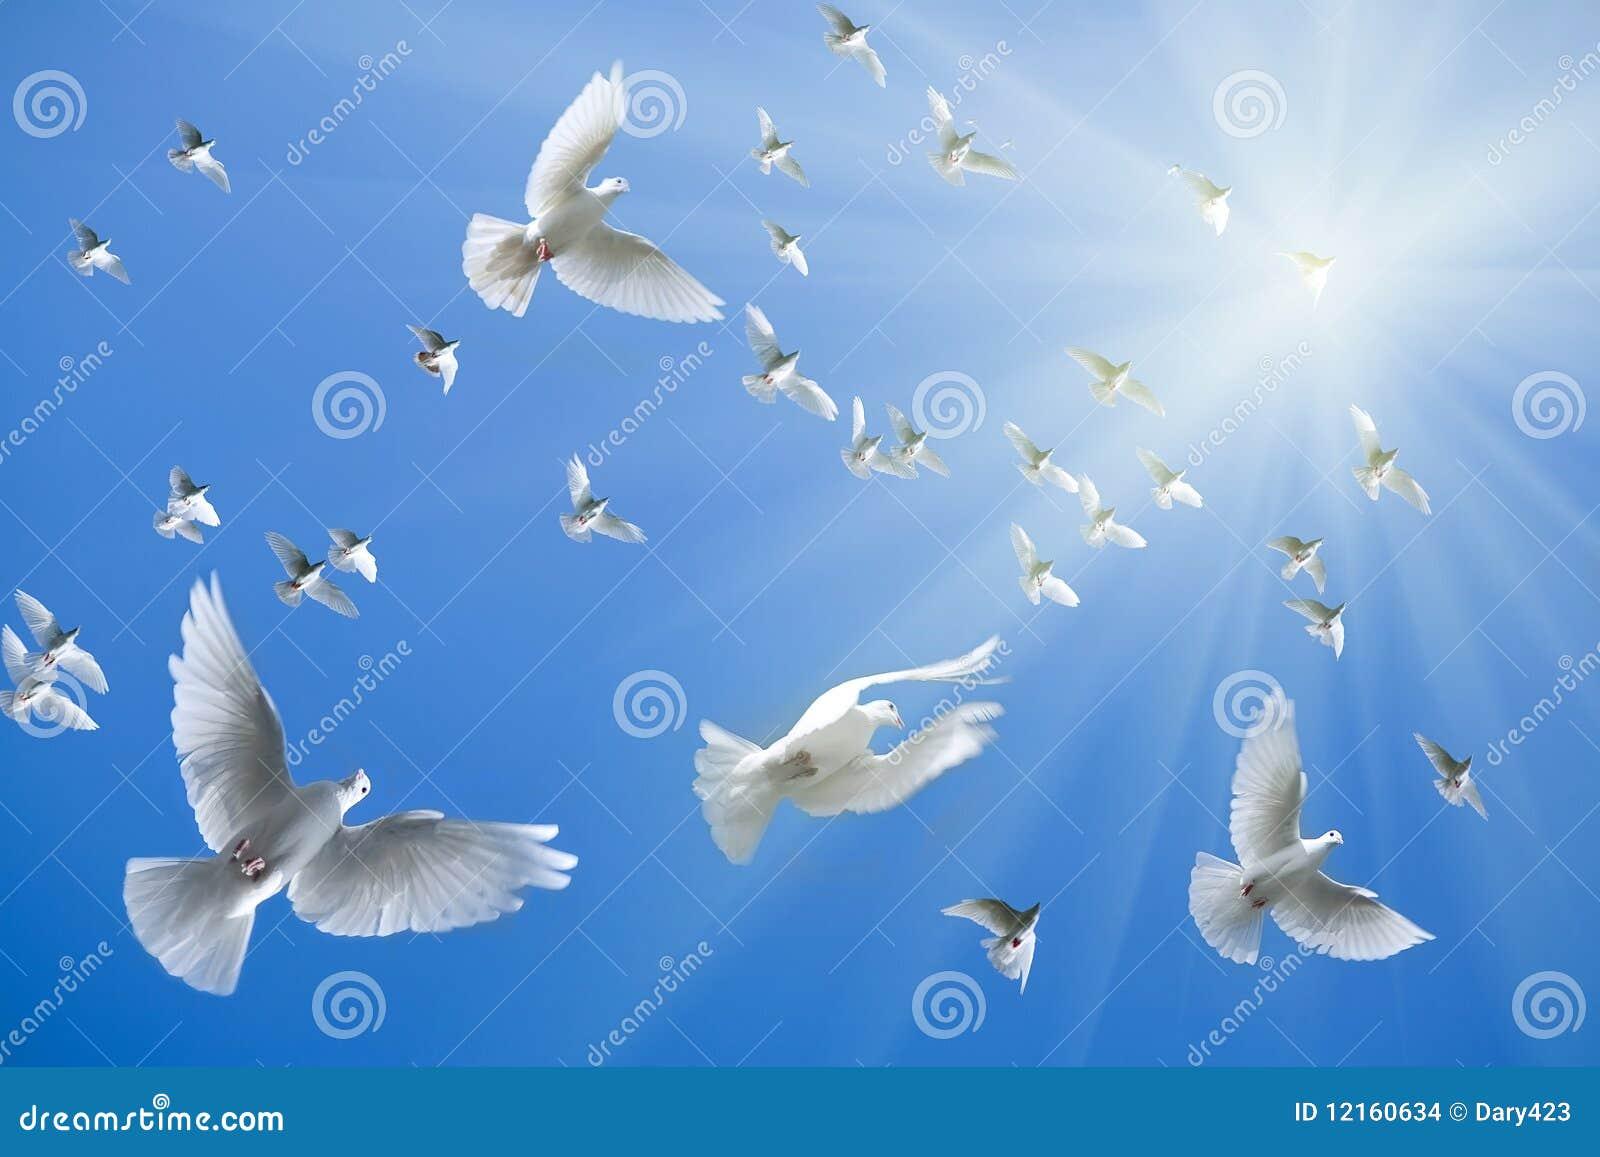 Pin White Dove Bird On Pinterest